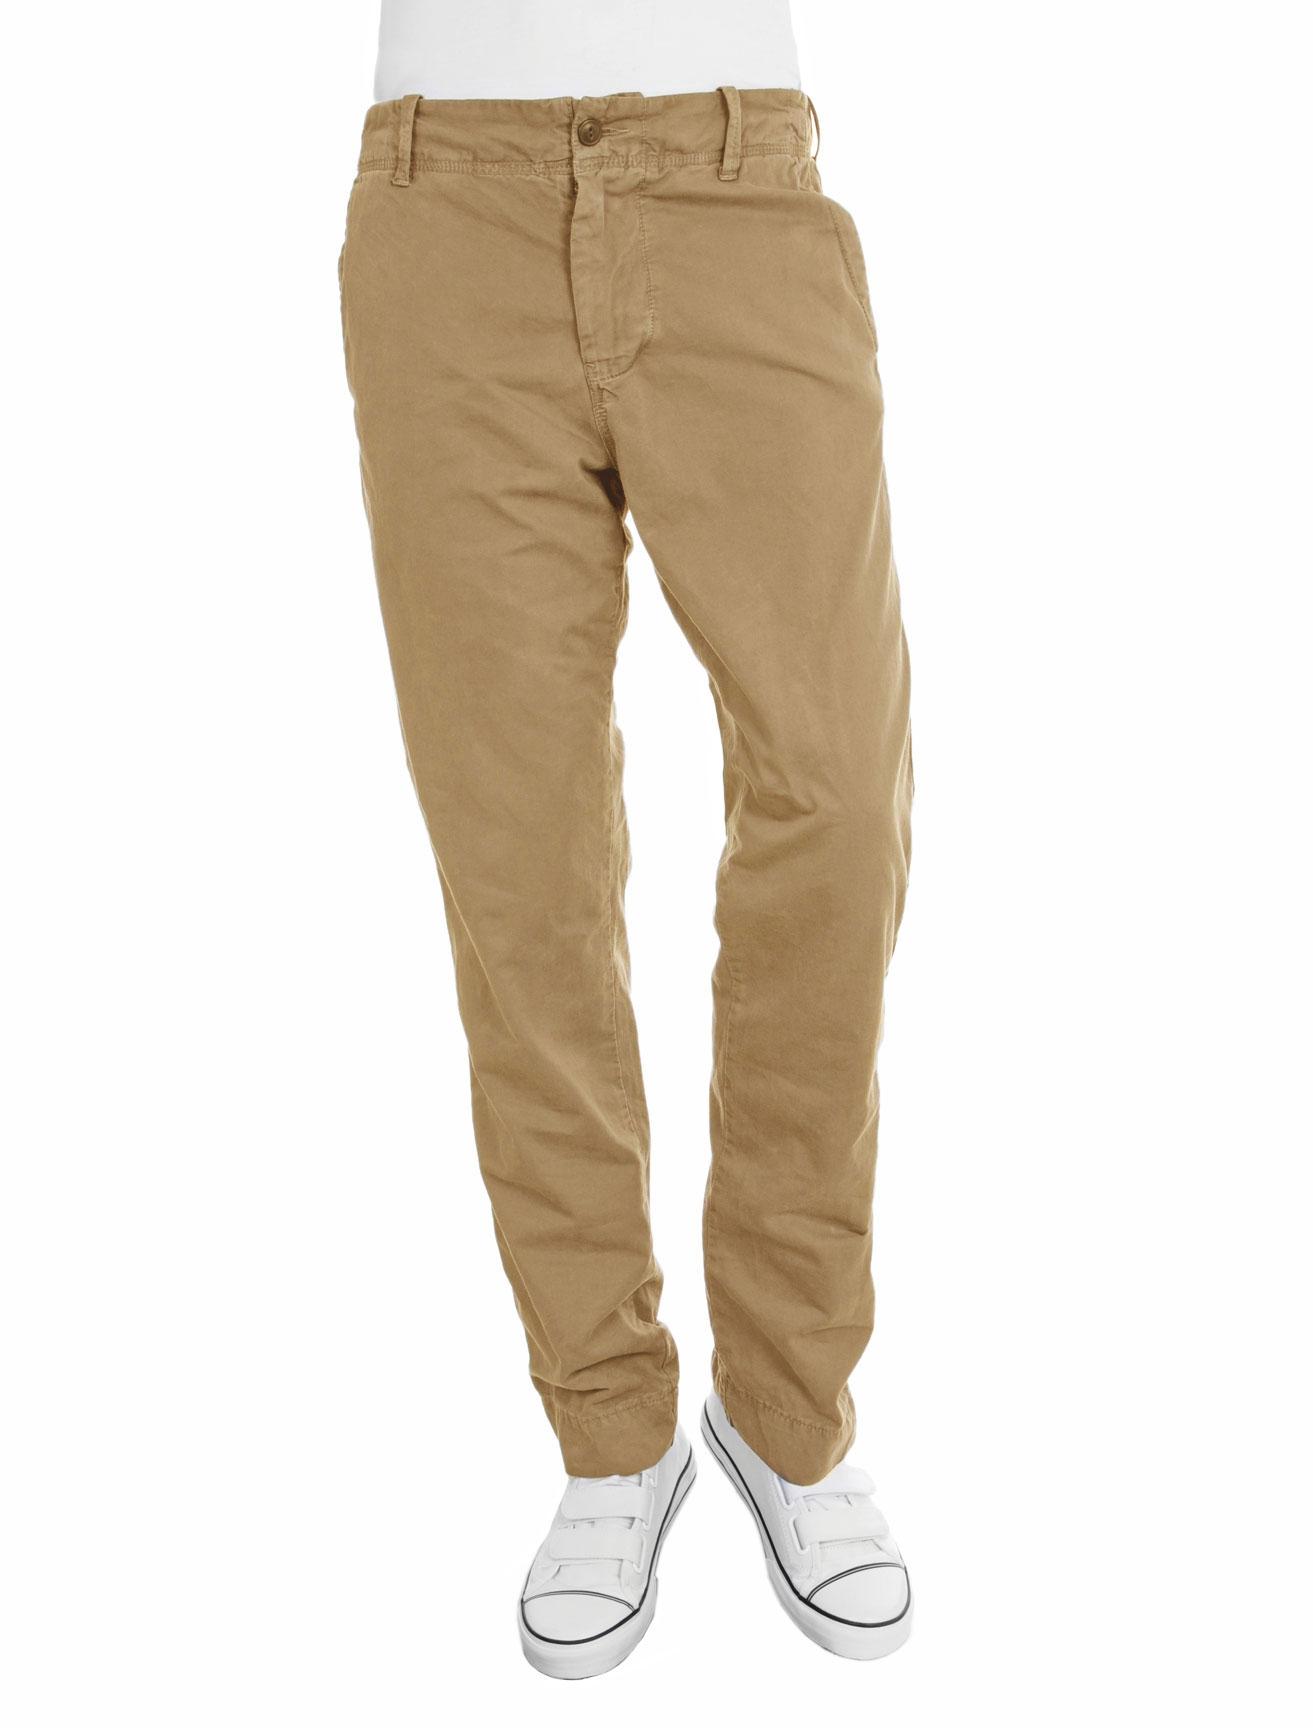 Creative Women Cargo Pants Branded Designed Bodycon Khaki Black Brown Gray